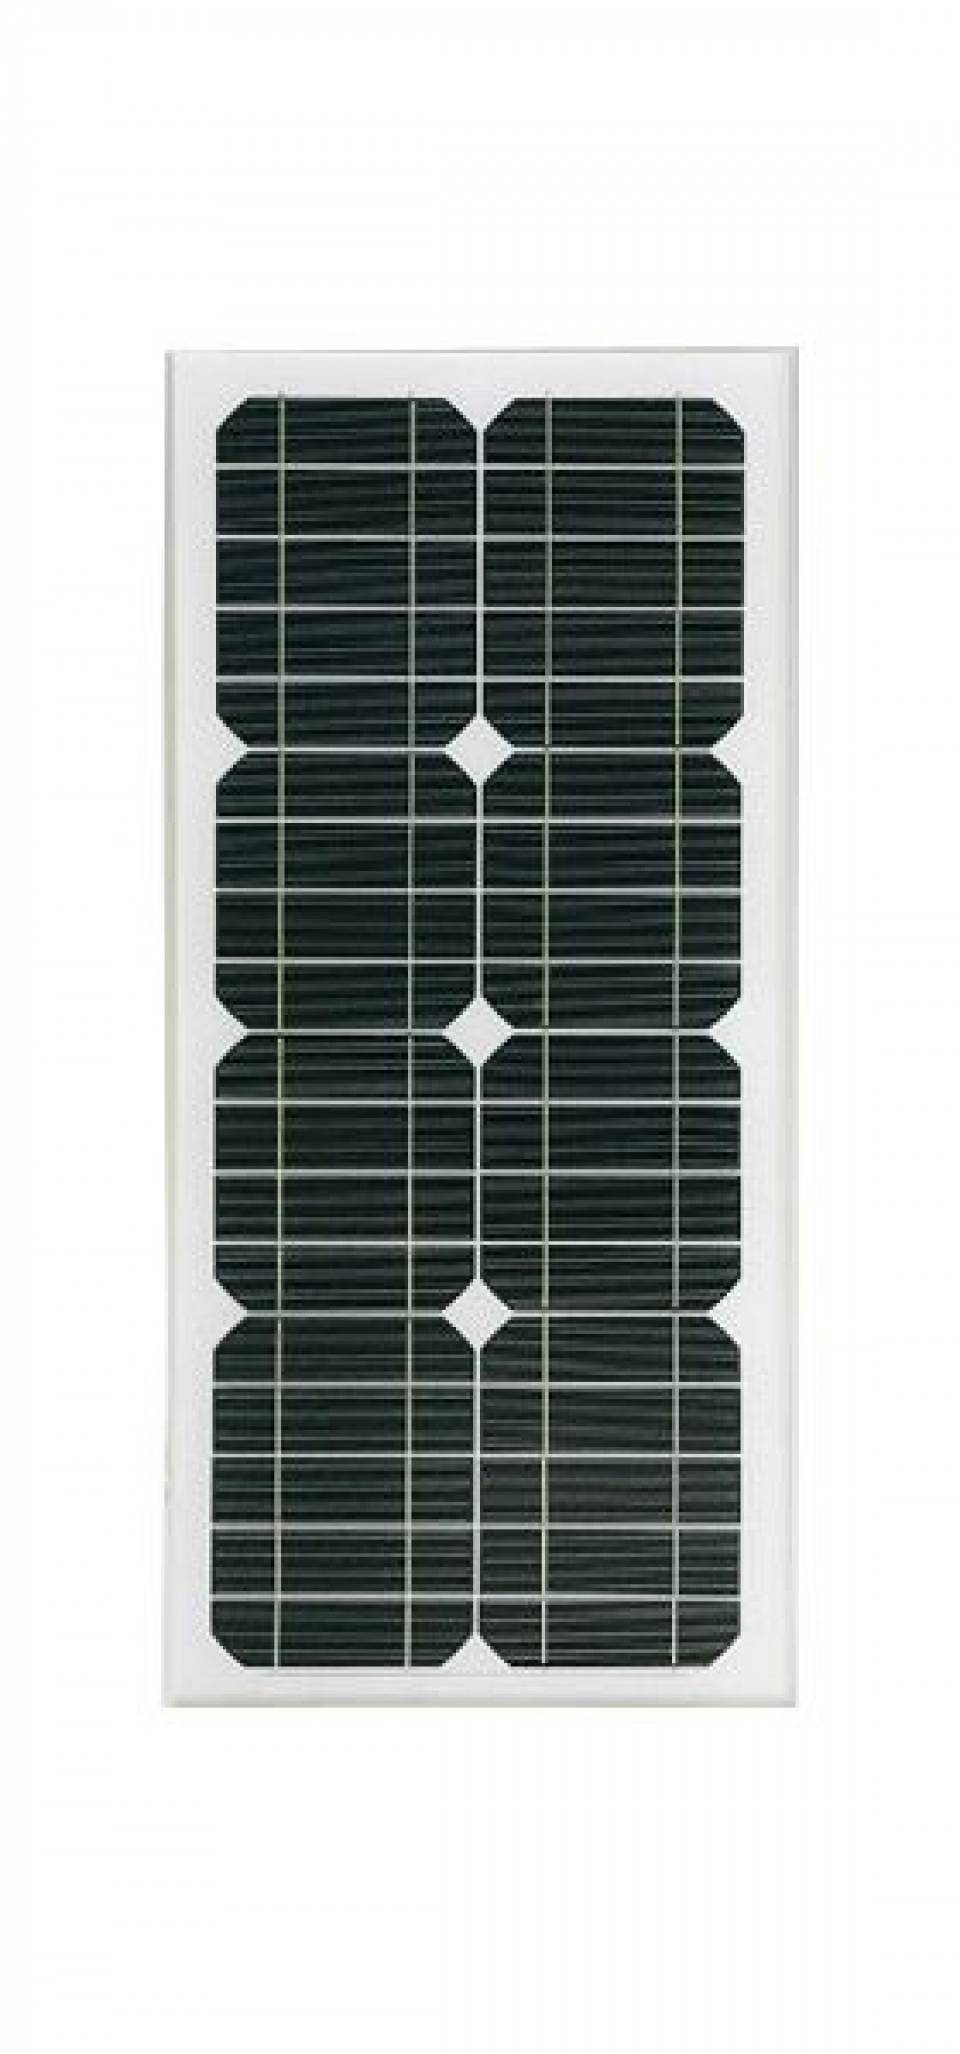 Panouri fotovoltaice monocristaline37705